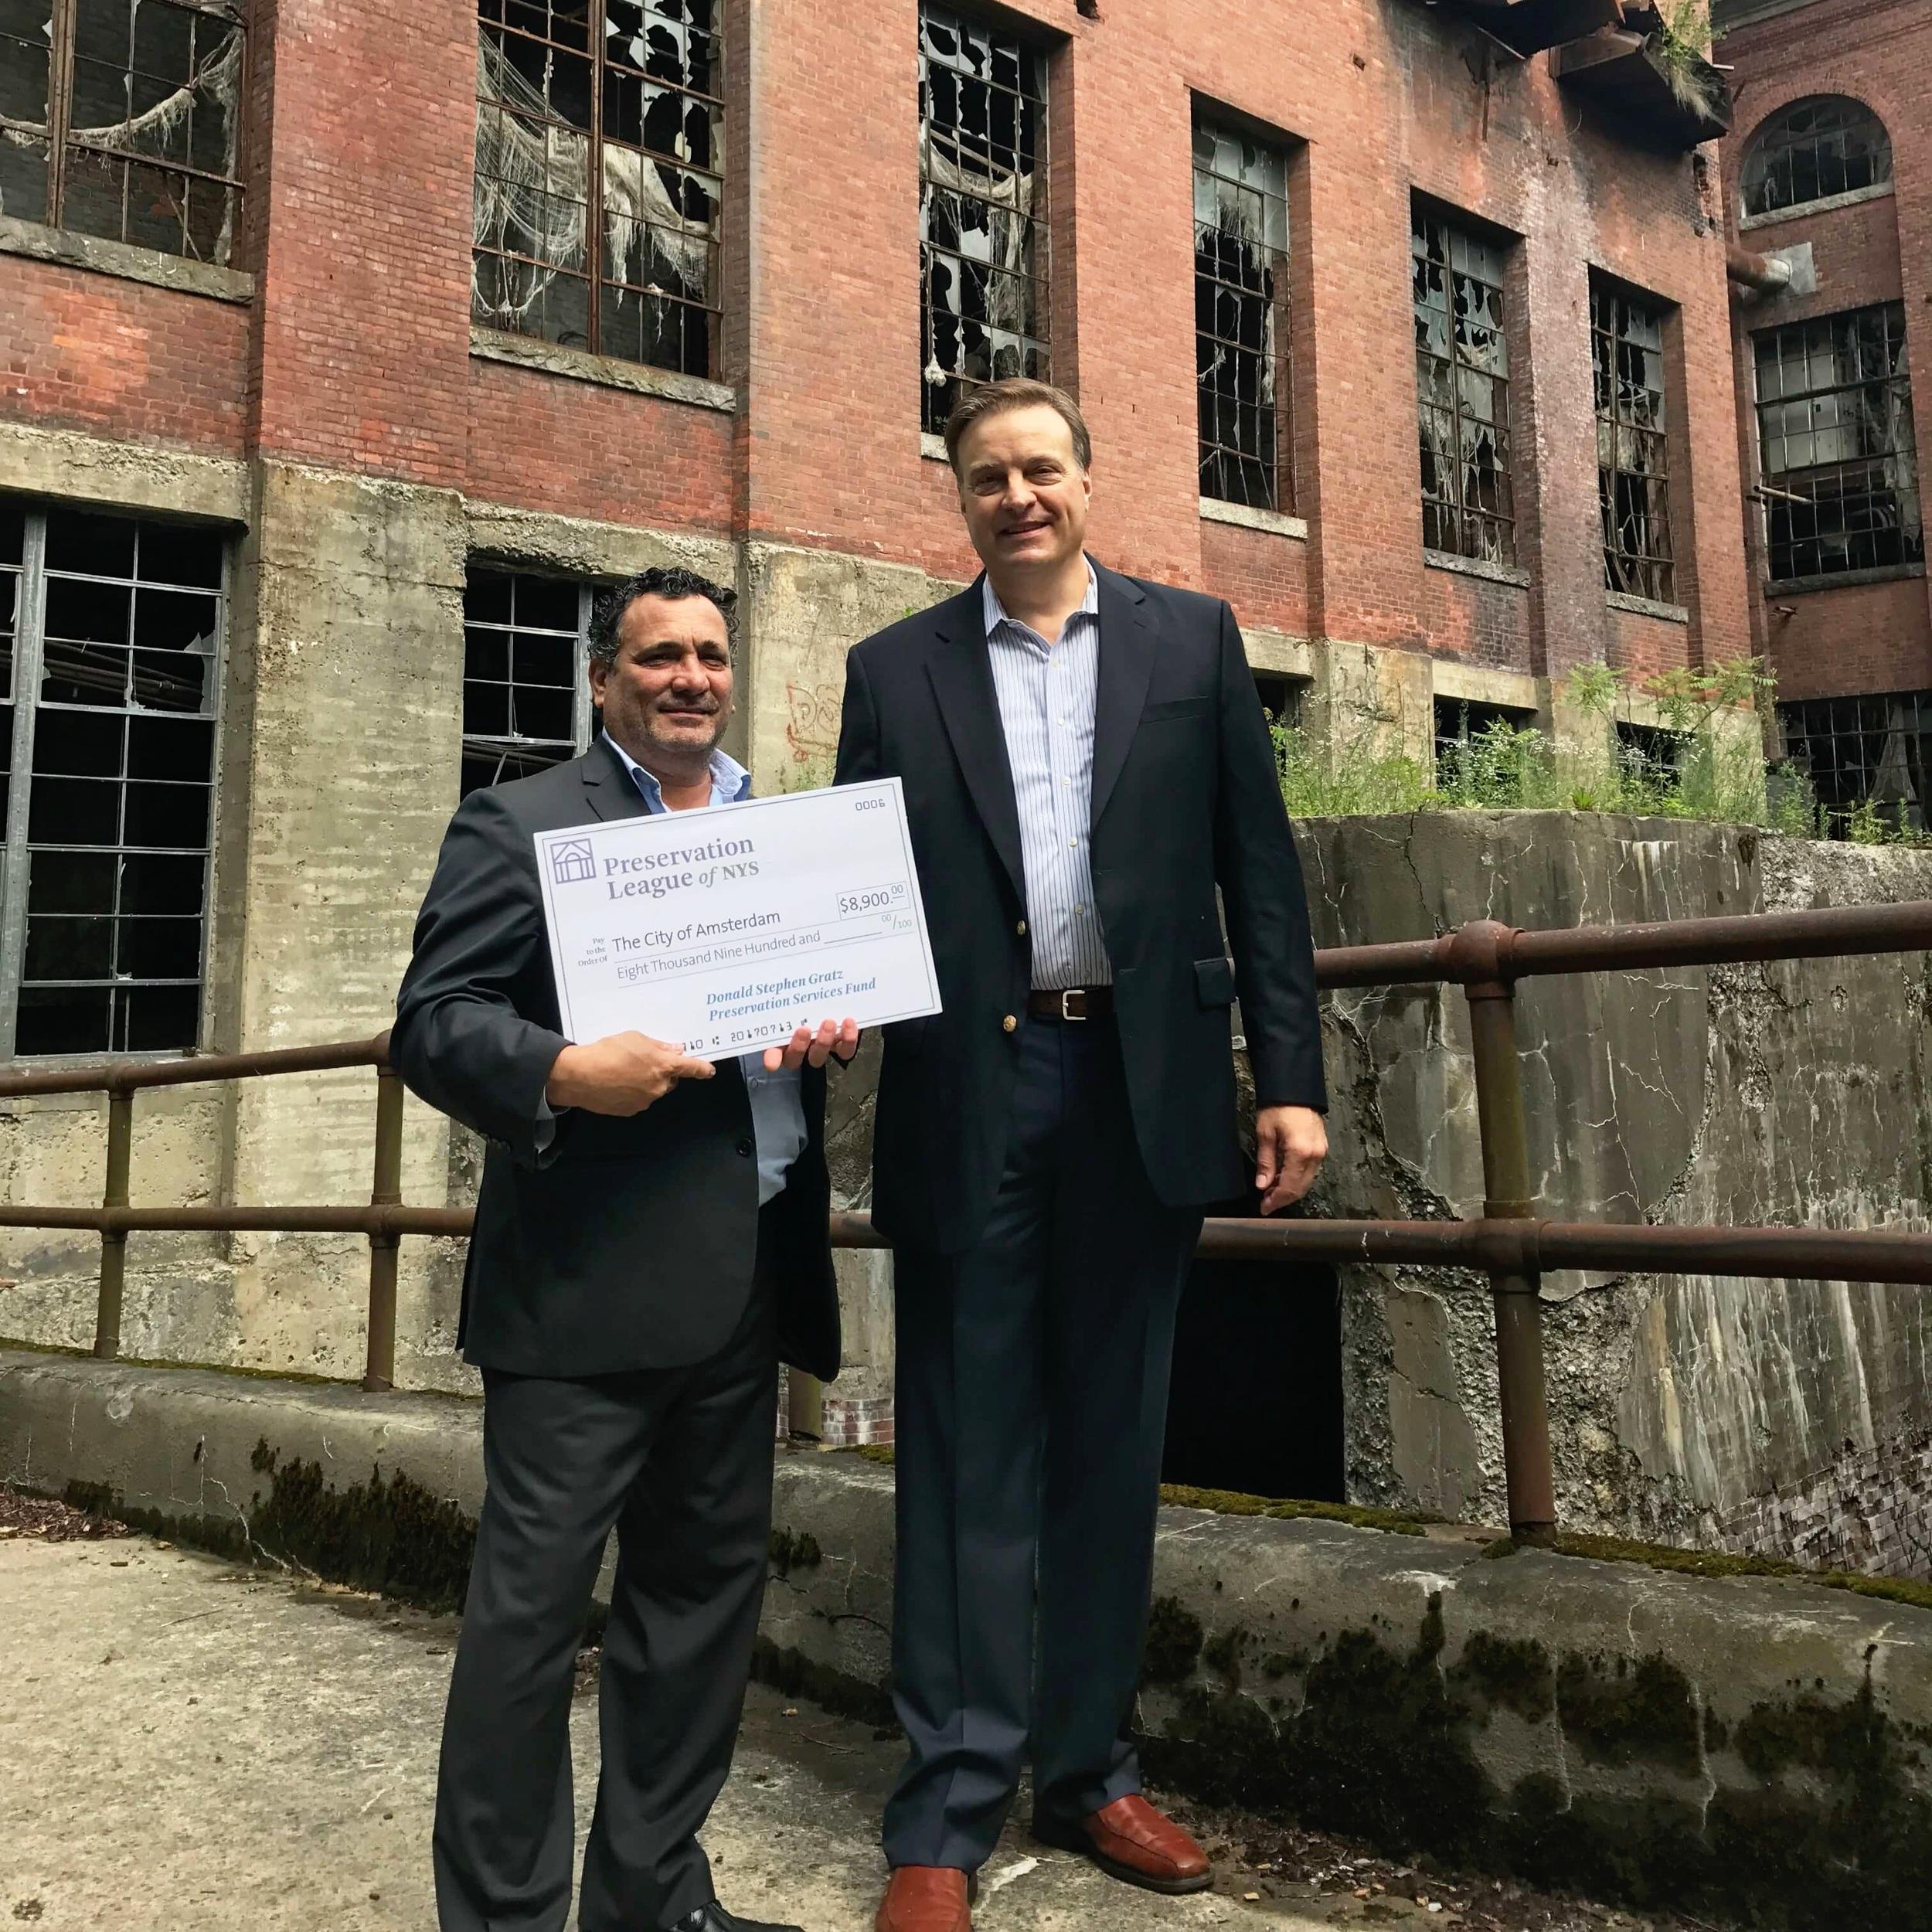 Amsterdam Mayor Michael Villa and Preservation League President Jay DiLorenzo